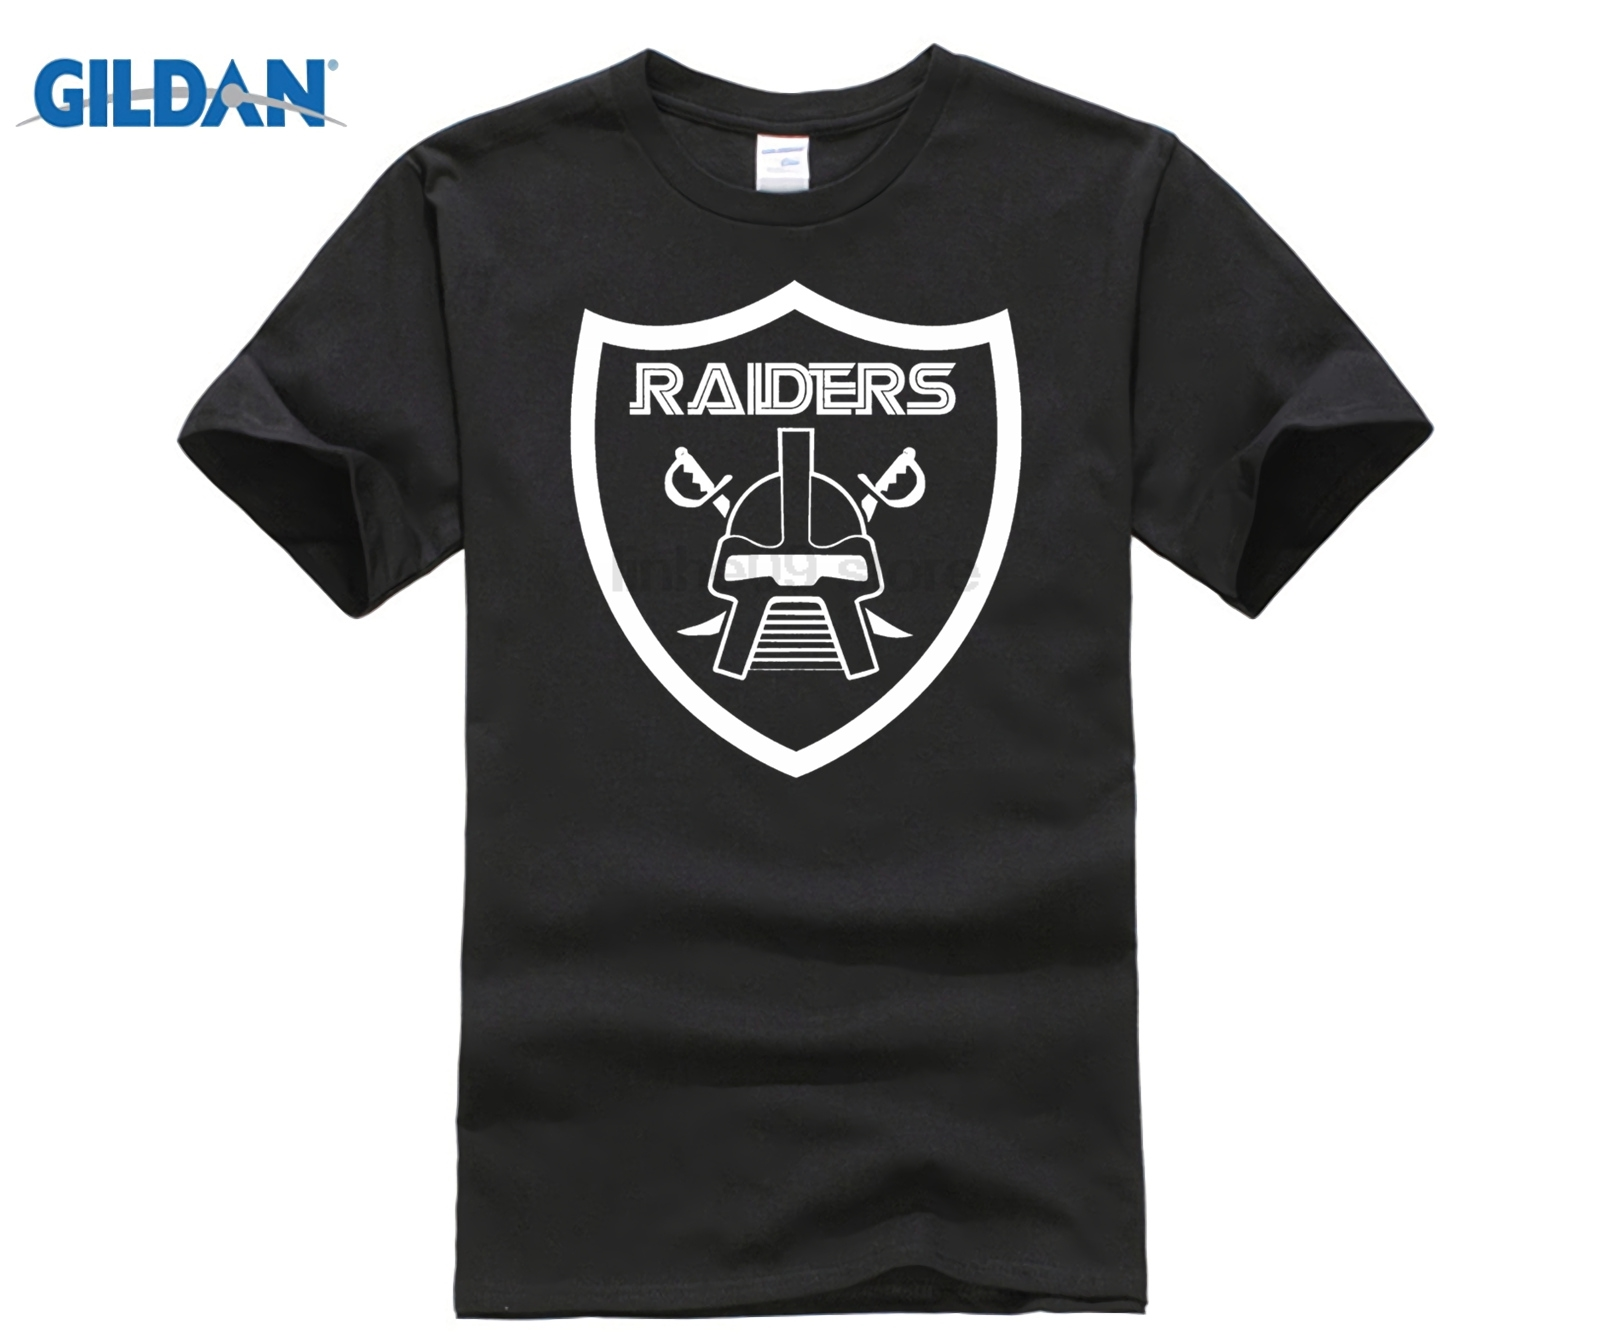 CYLON RAIDERS BATTLESTAR GALACTICA T SHIRT ( S - 3XL ) RETRO TV SERIES Hip-Hop Simple Splicing Tee Tops T-Shirt